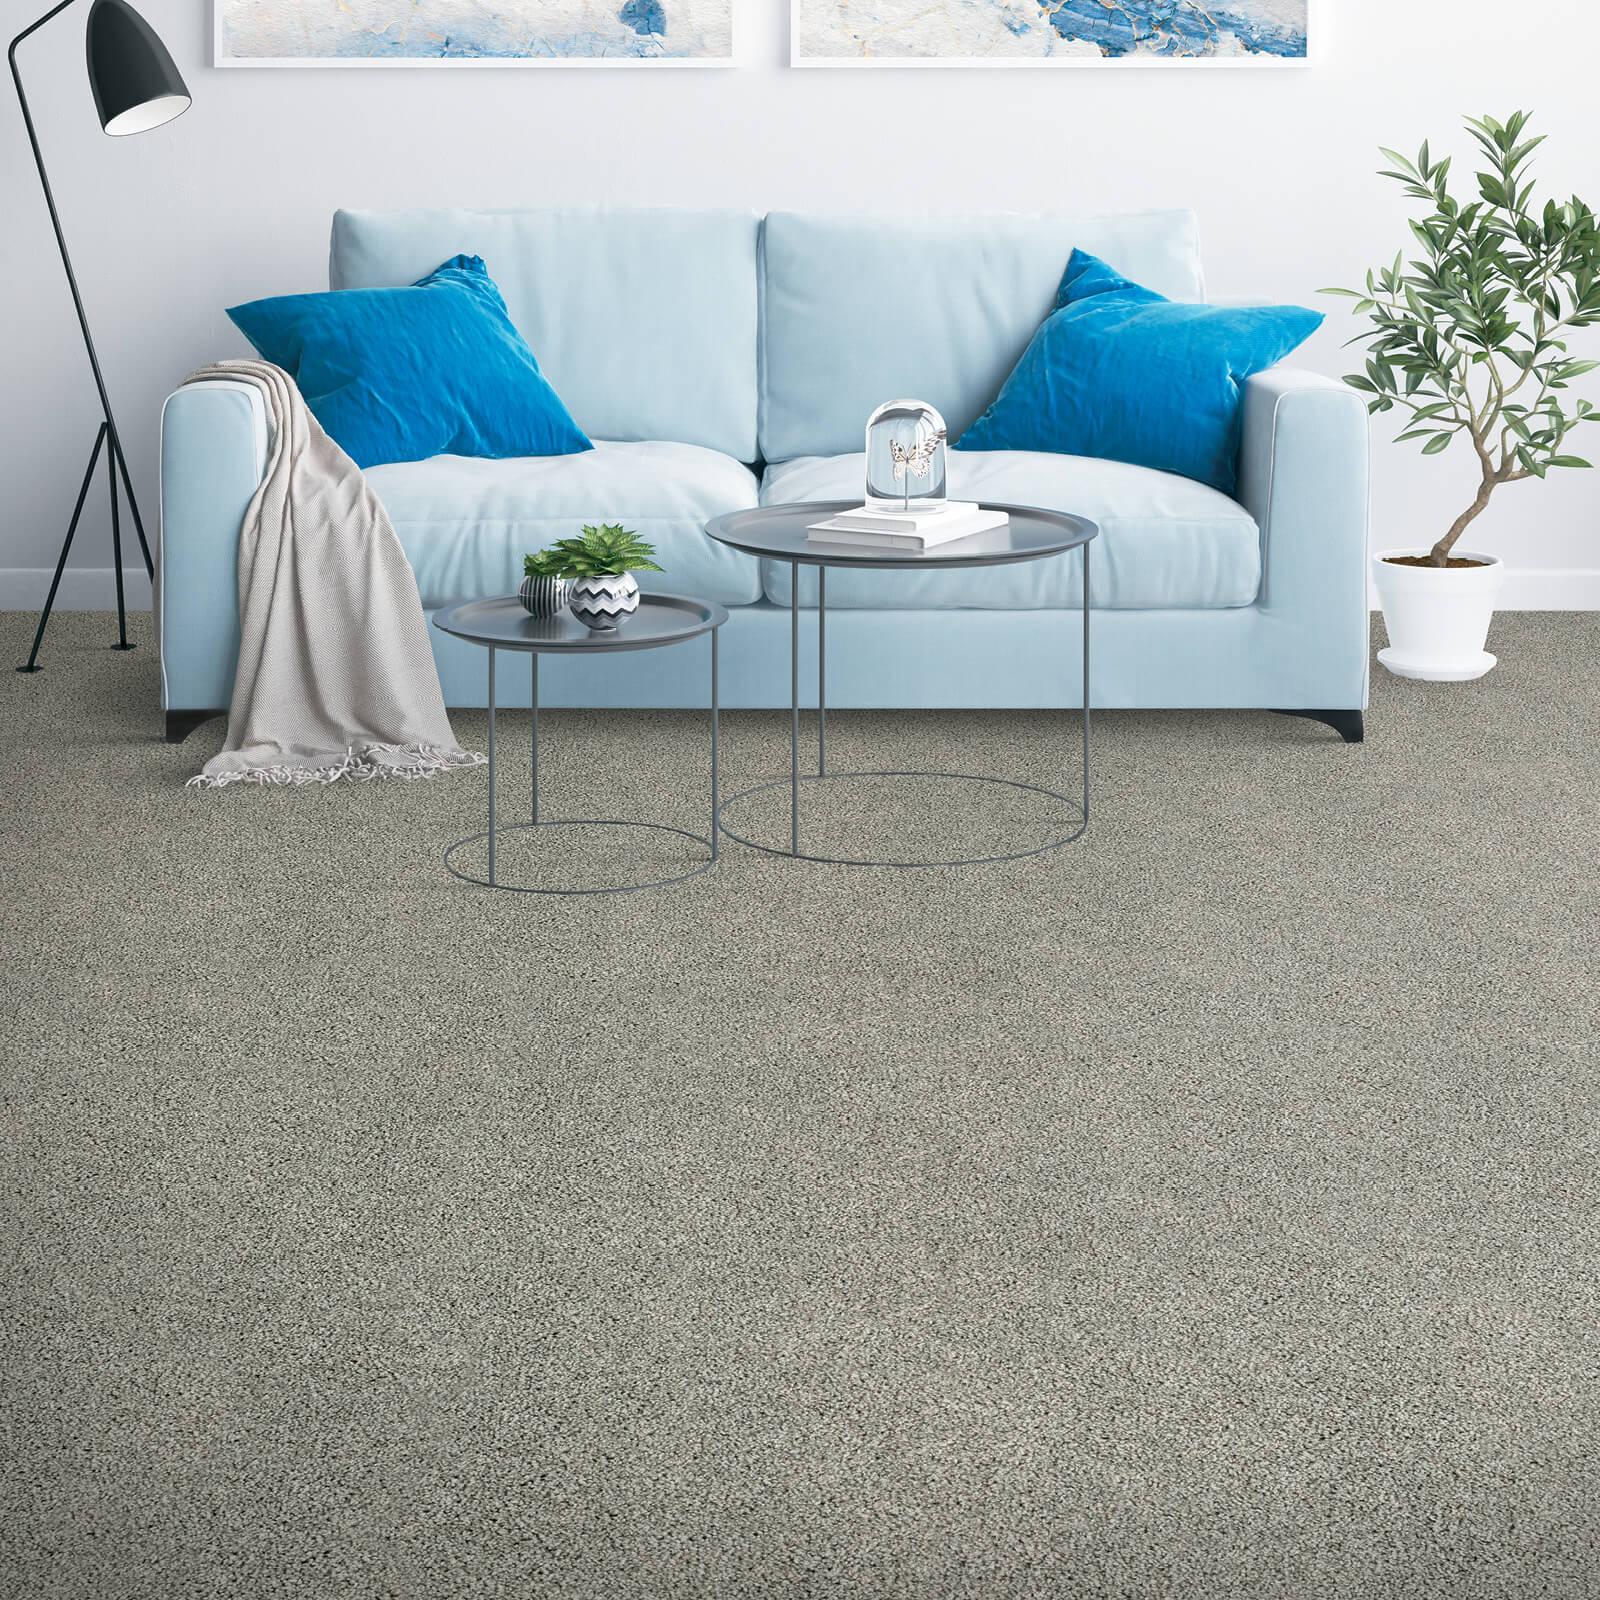 Placid reflection | Flooring by Wilson's Carpet Plus